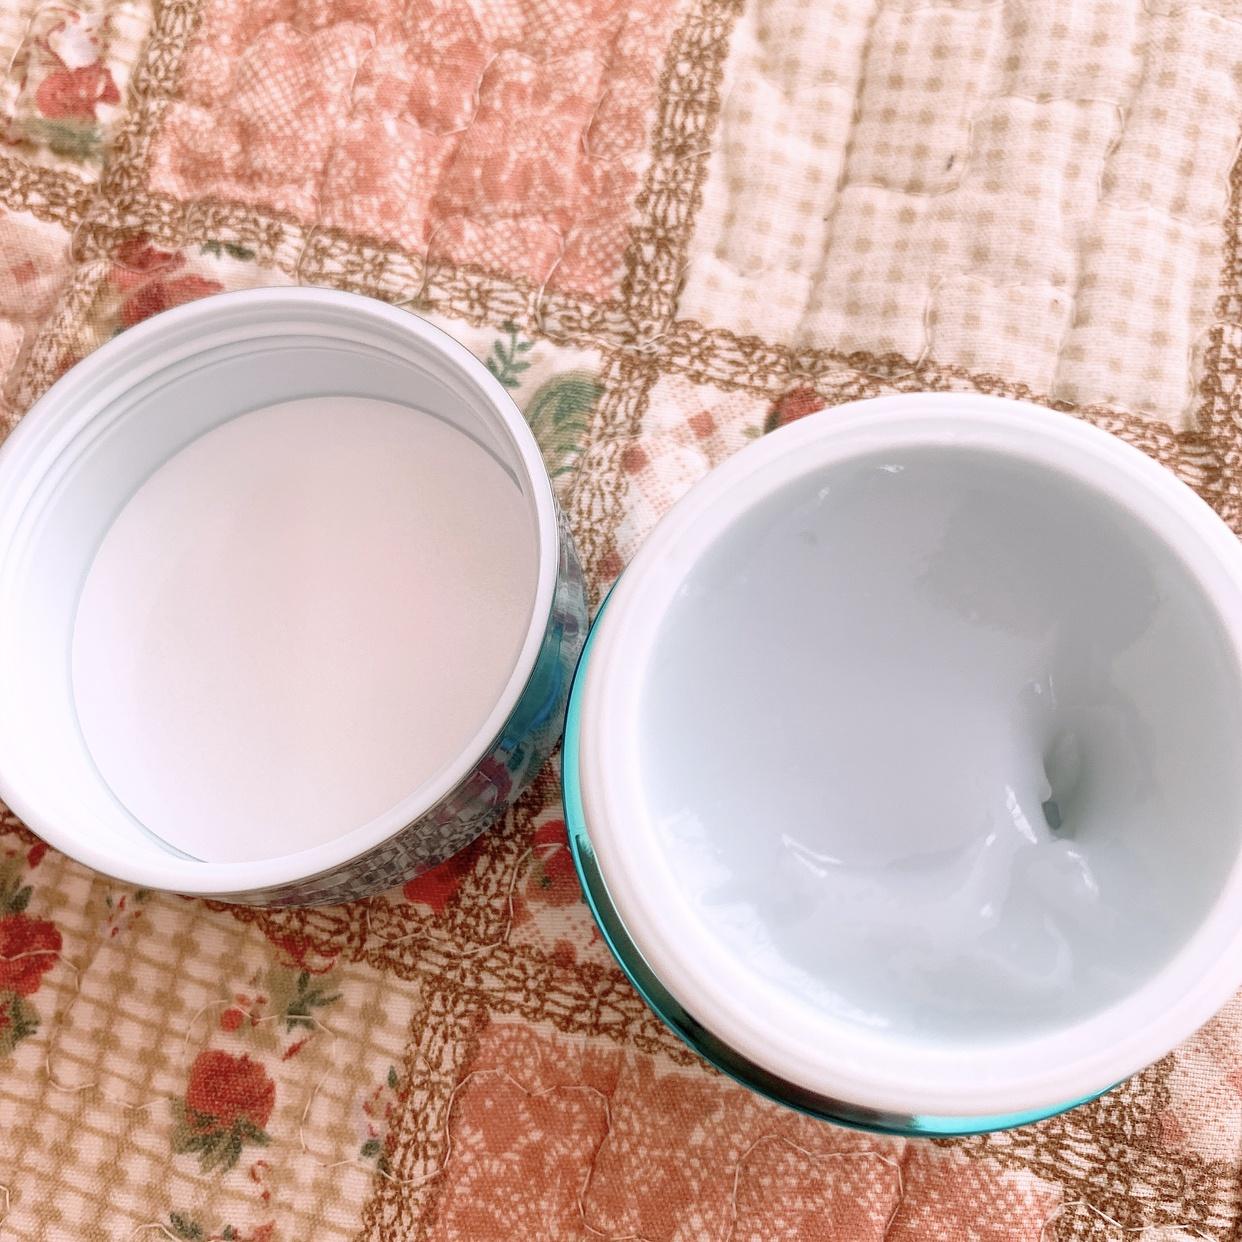 SOFINA  iP(ソフィーナ アイピー) インターリンクセラム 毛穴の目立たない澄んだうるおい肌へを使ったまりたそさんのクチコミ画像3